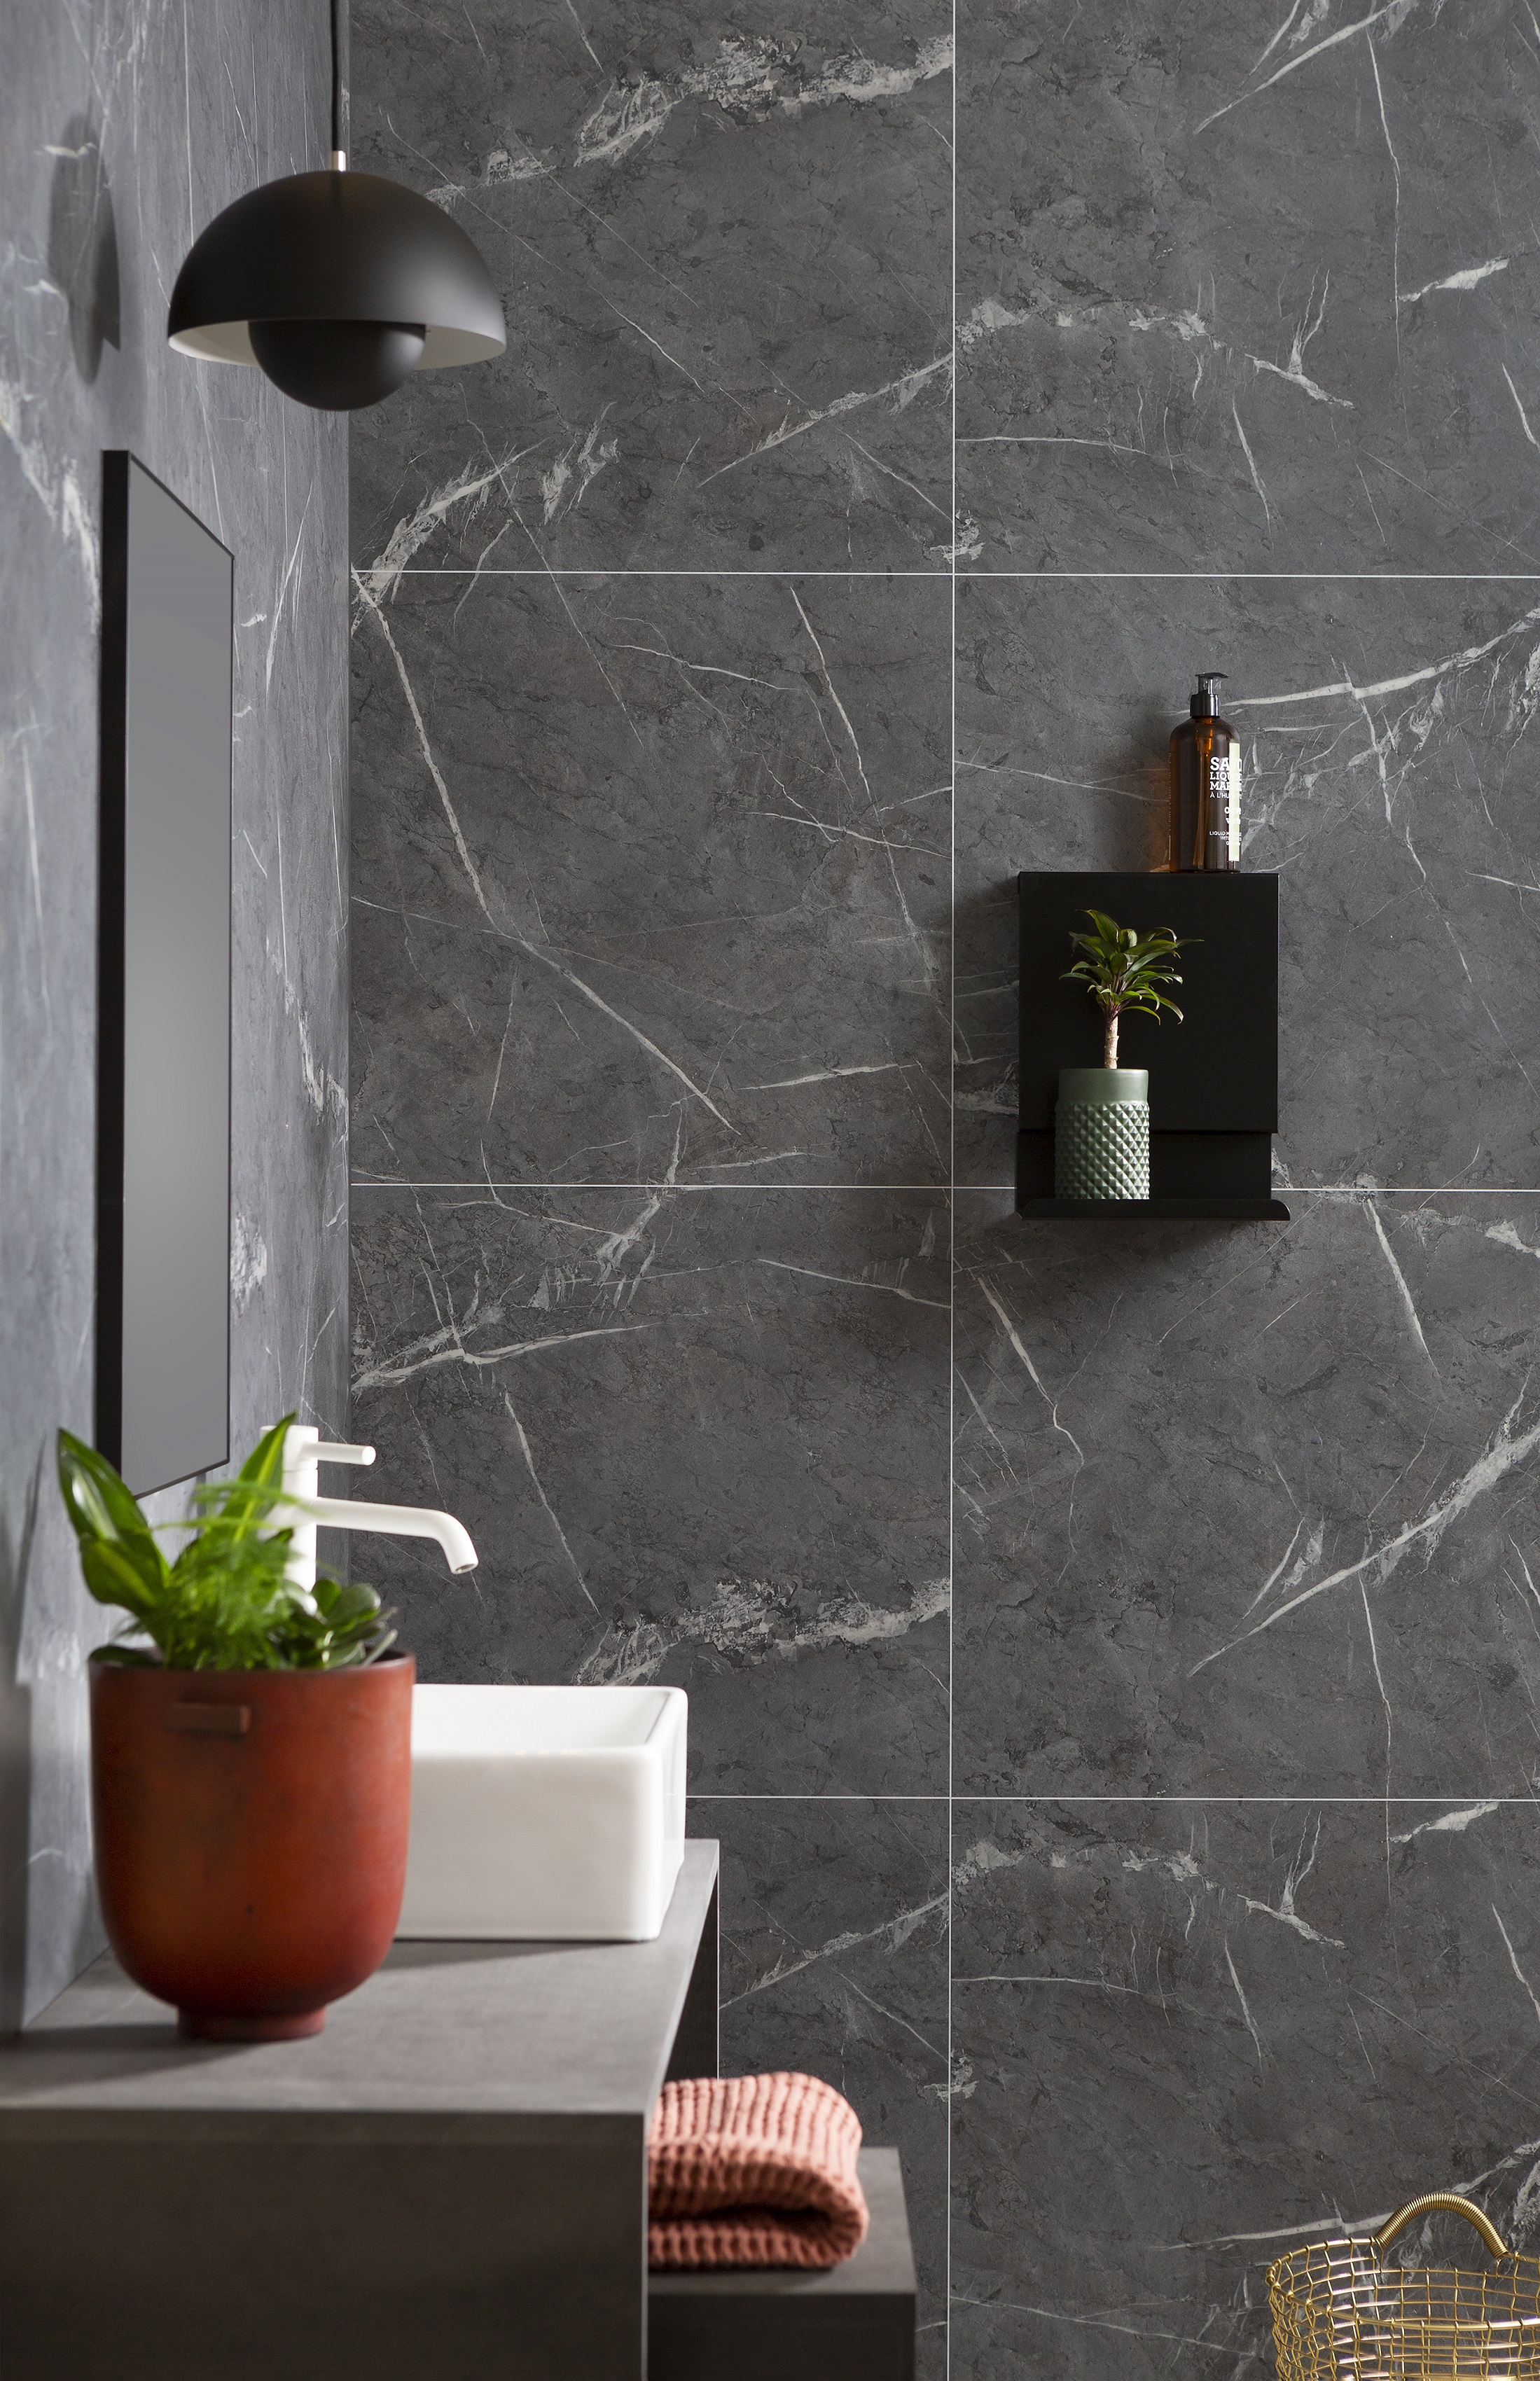 Fibo Black Marble wall panel